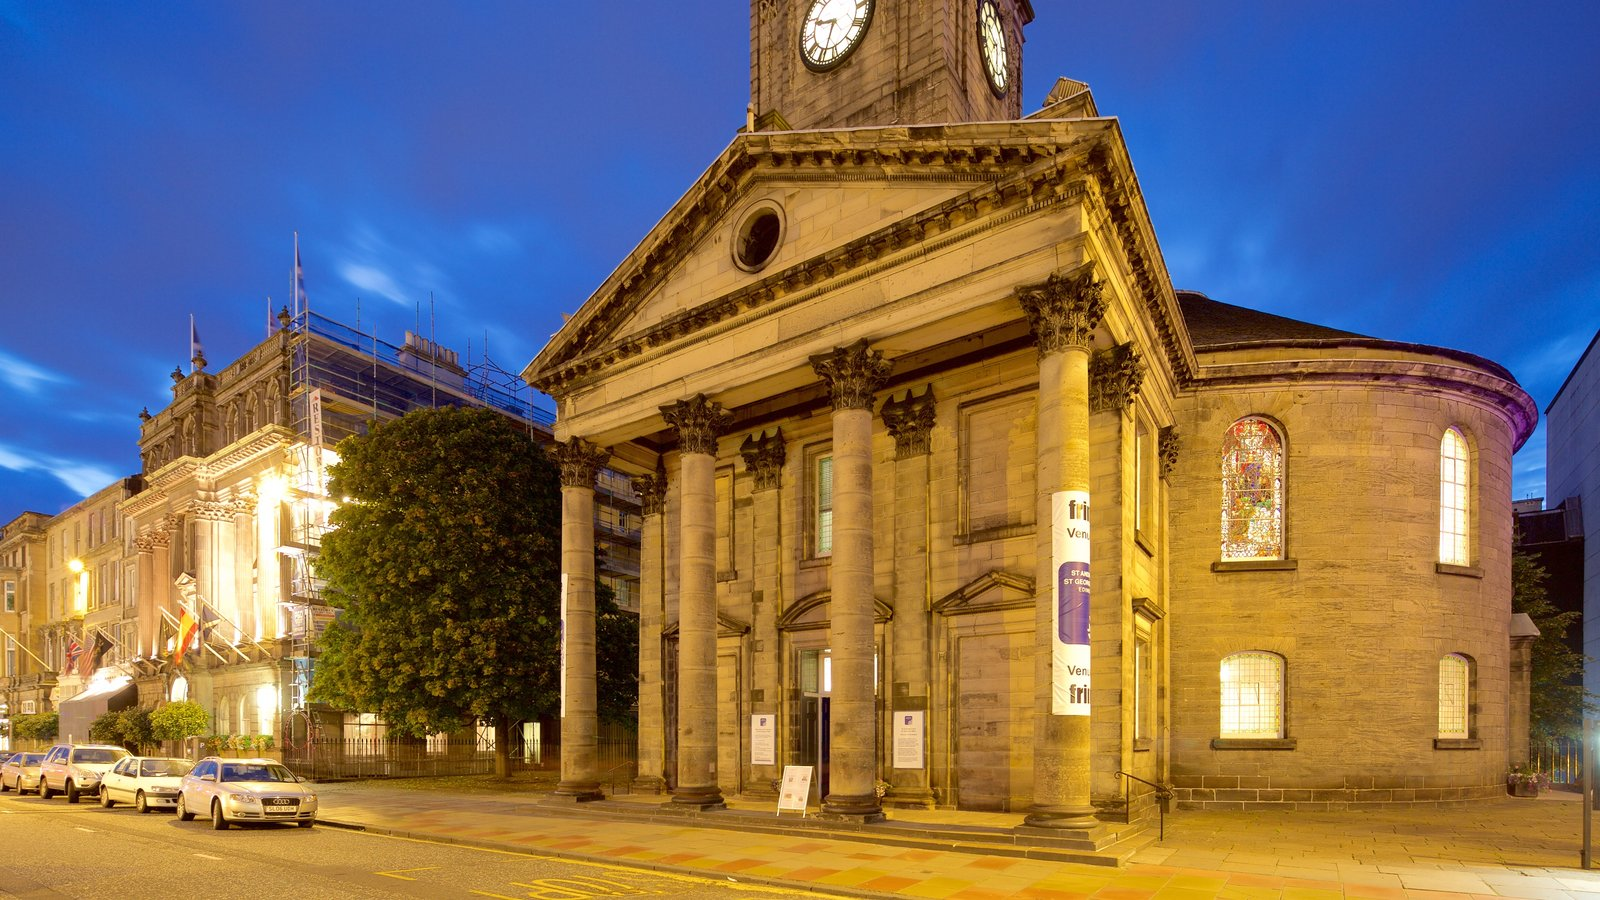 Edinburgh showing heritage architecture and night scenes